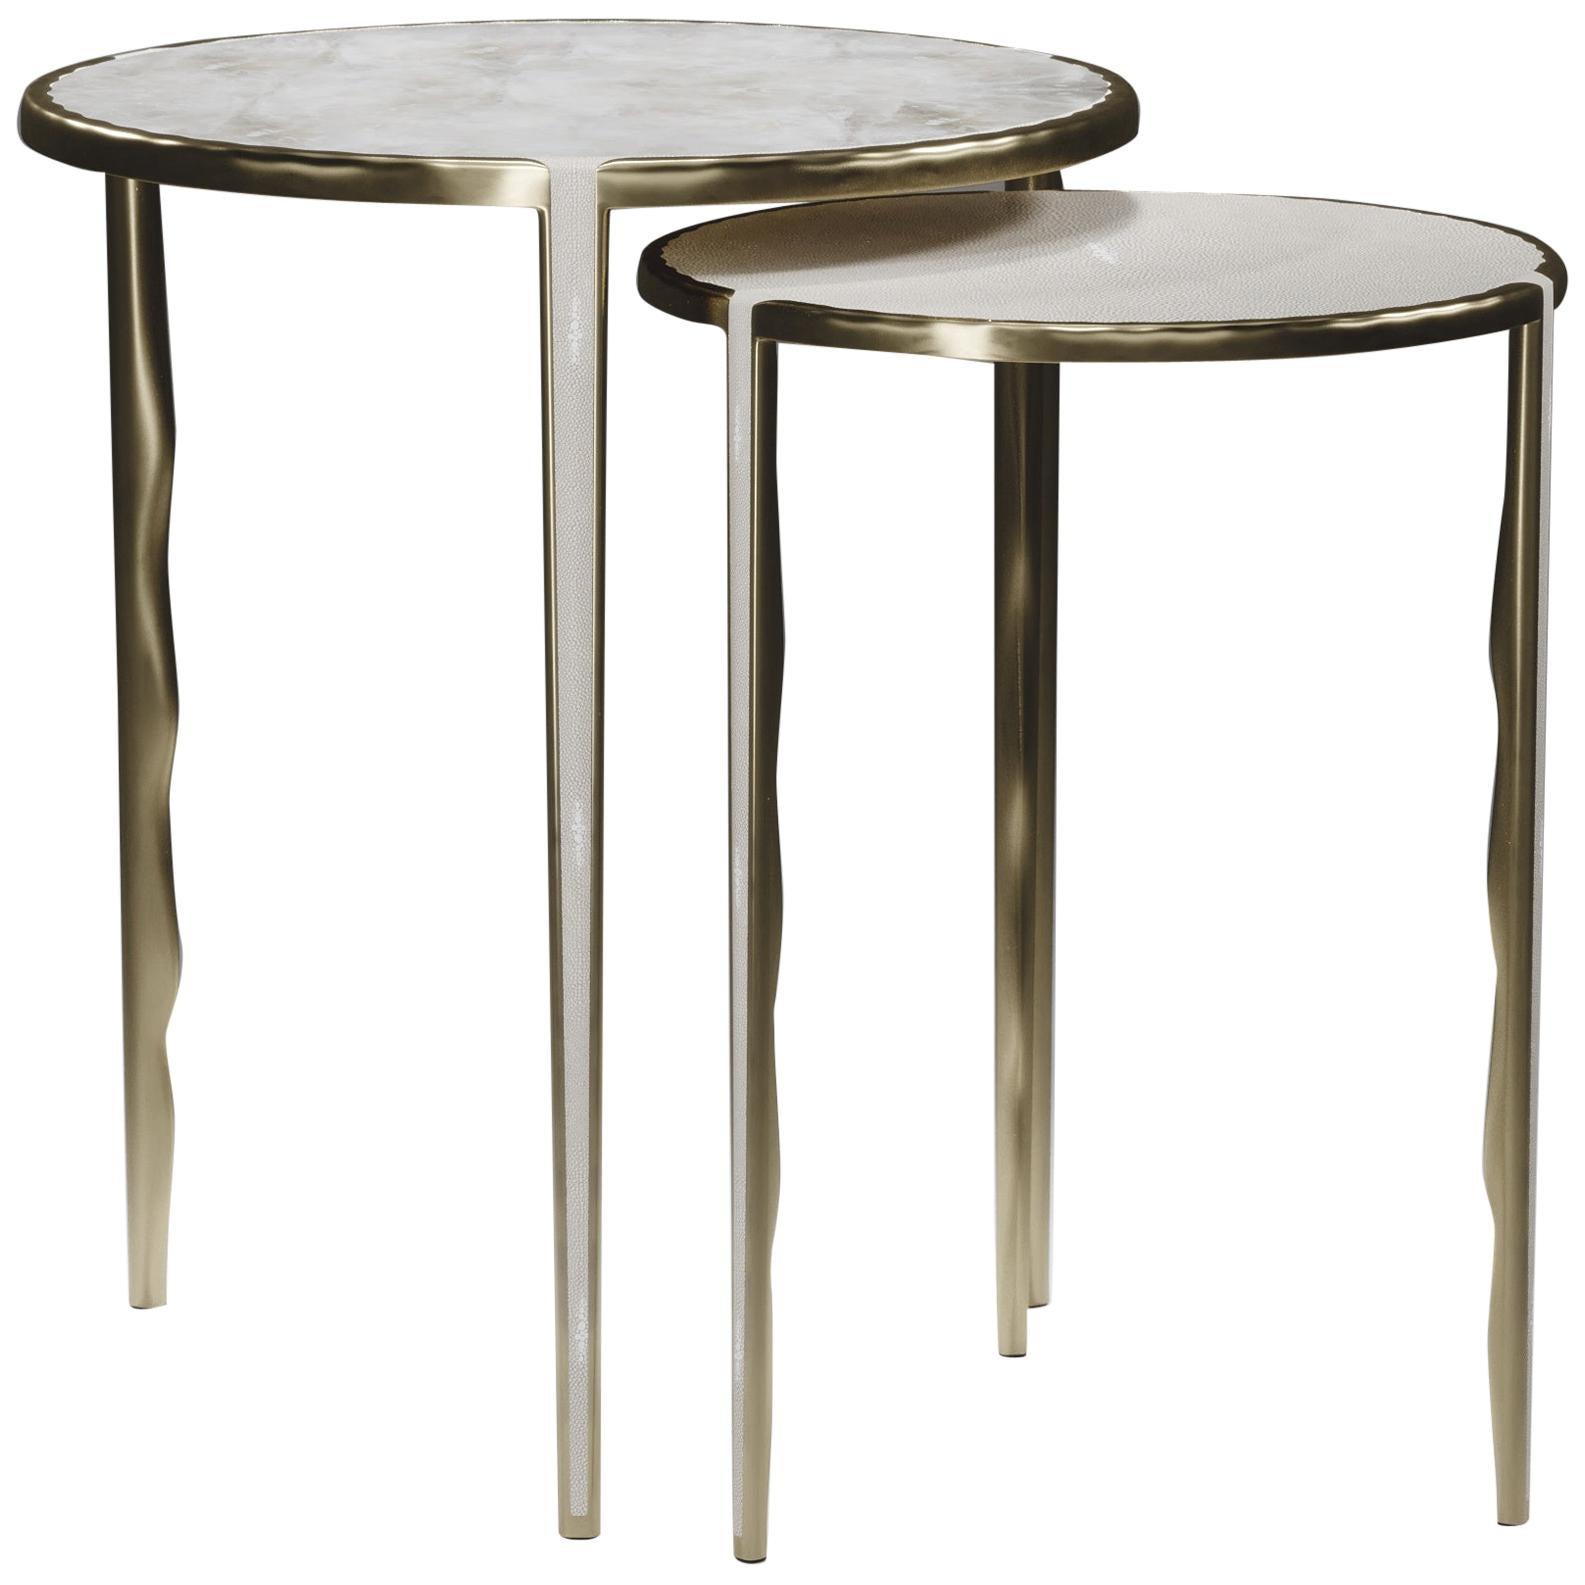 Shagreen & Quartz Nesting Tables w/ Bronze-Patina Brass Accents by R&Y Augousti